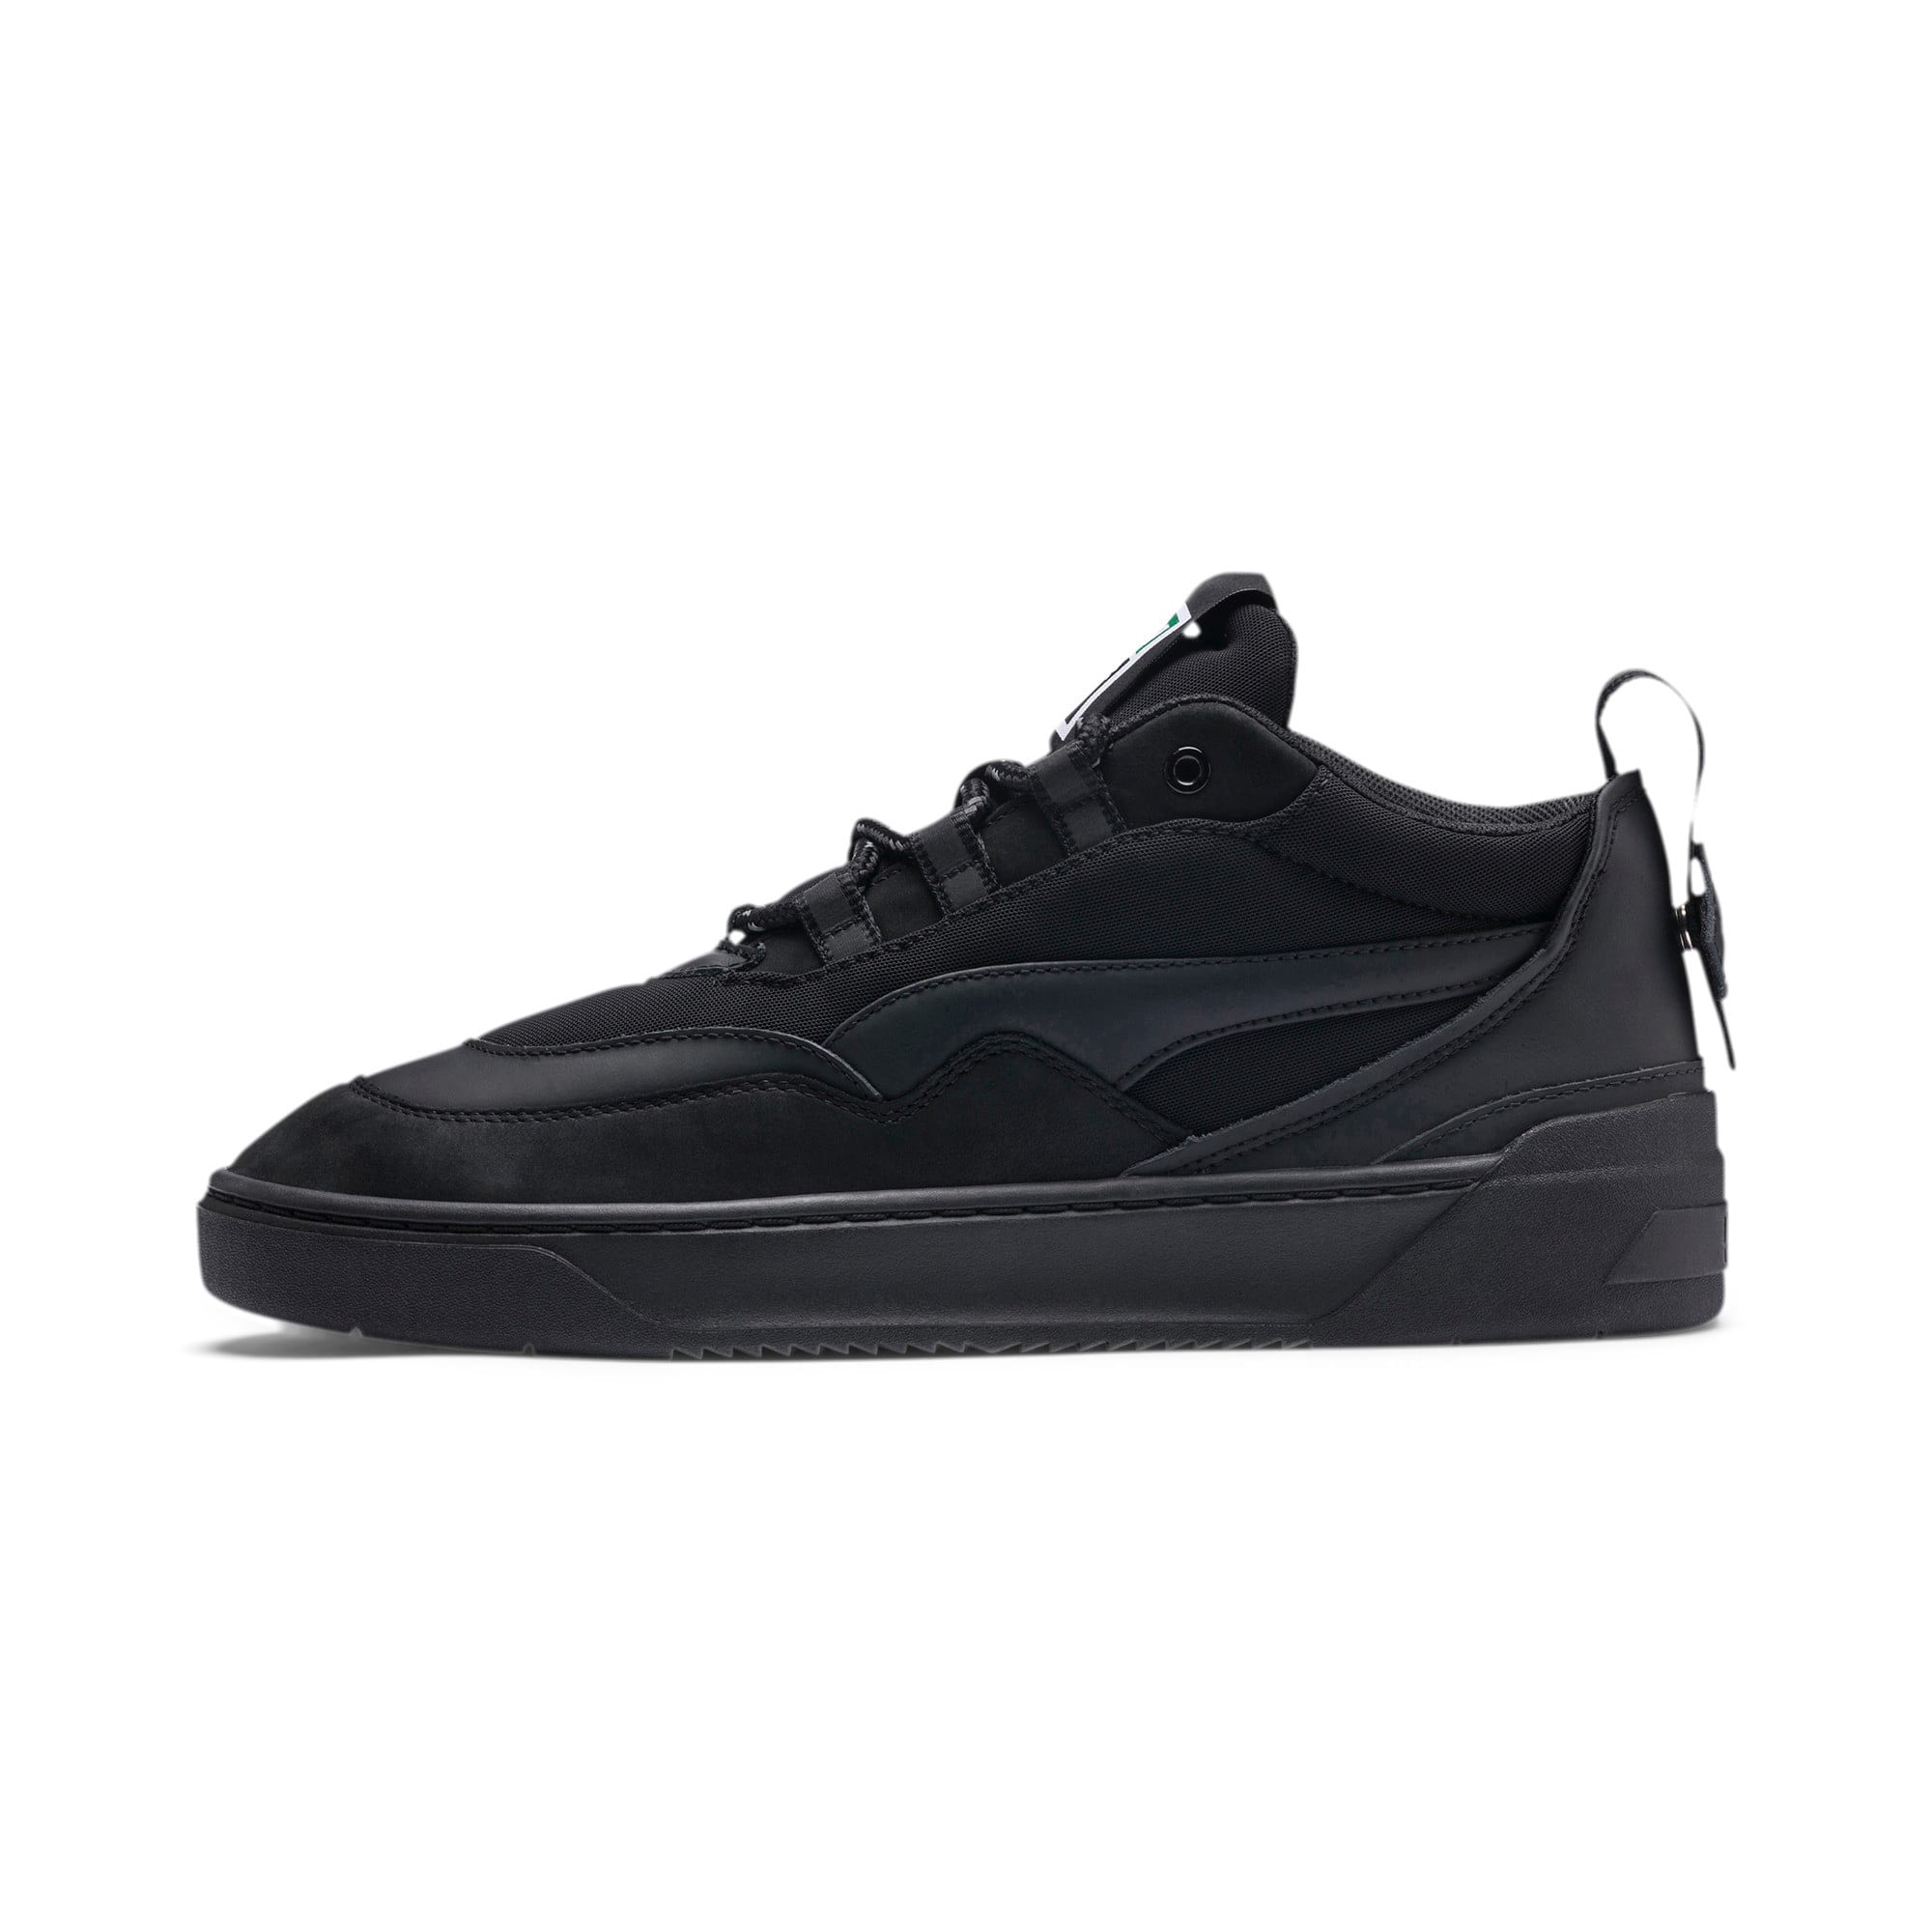 Thumbnail 1 of Cali Zero Demi Triple Black Sneakers, Puma Black-Puma Black, medium